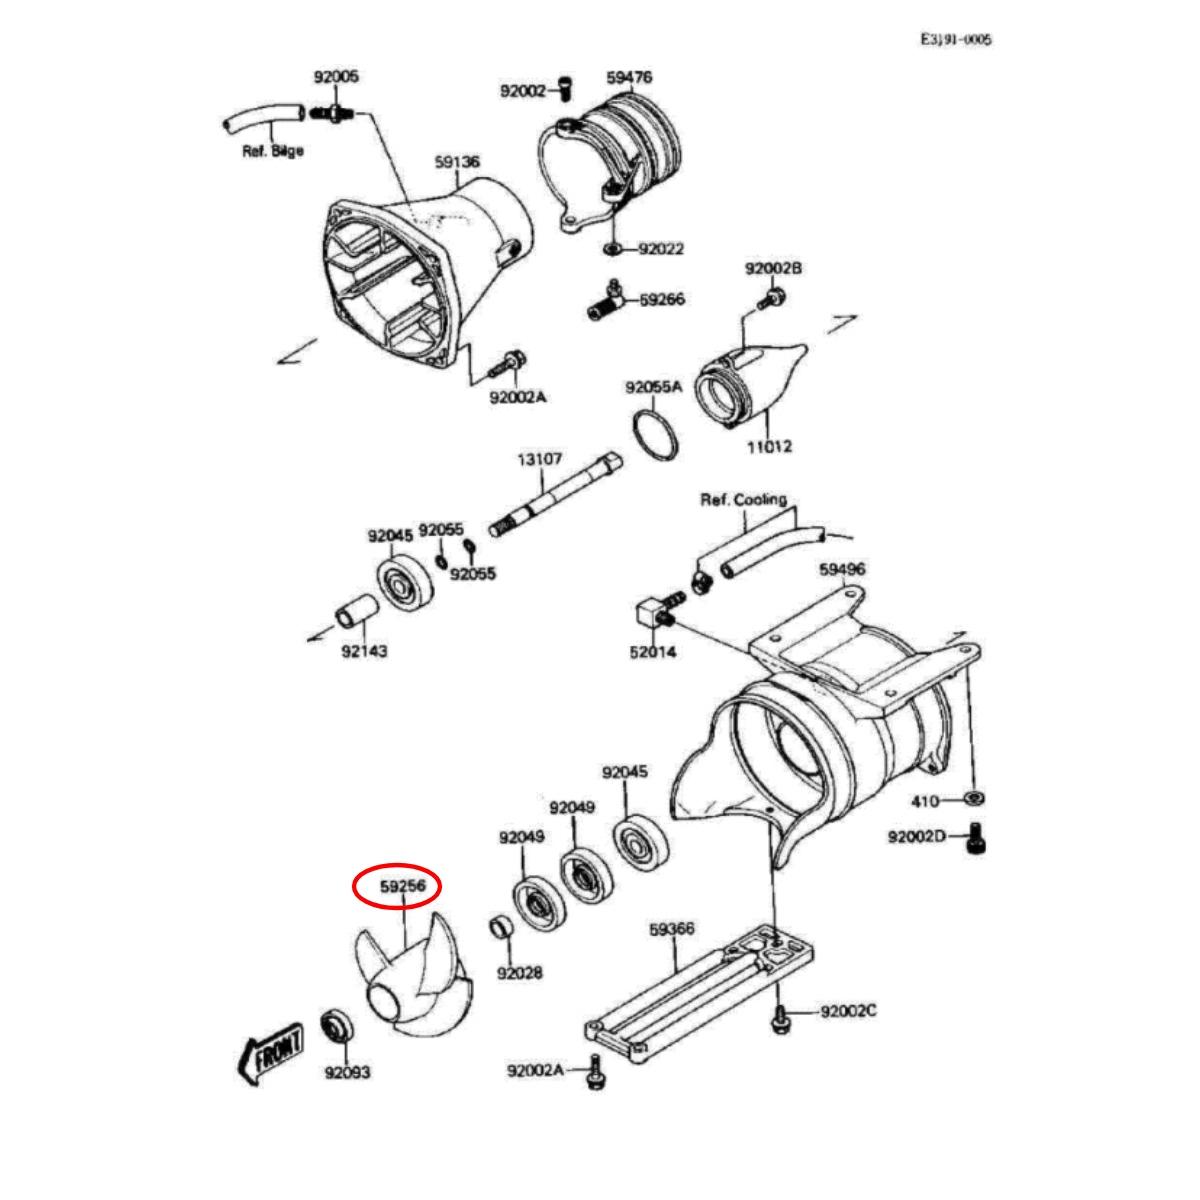 Helice Solas para Jet Ski Kawasaki st/xi/sx 750cc 14/19  - Radical Peças - Peças para Jet Ski